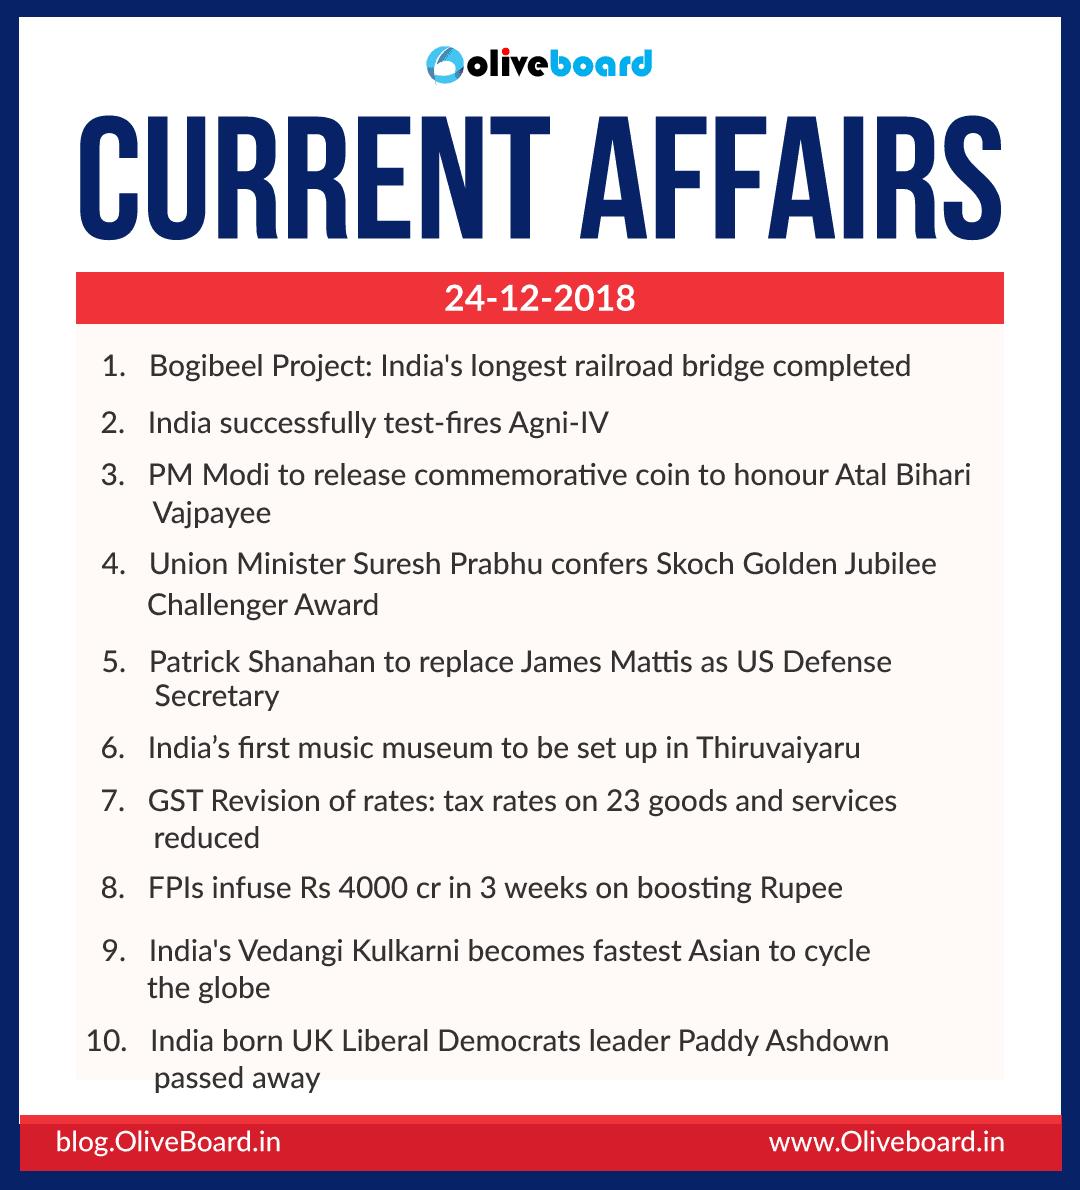 Current Affairs: 24 December 2018